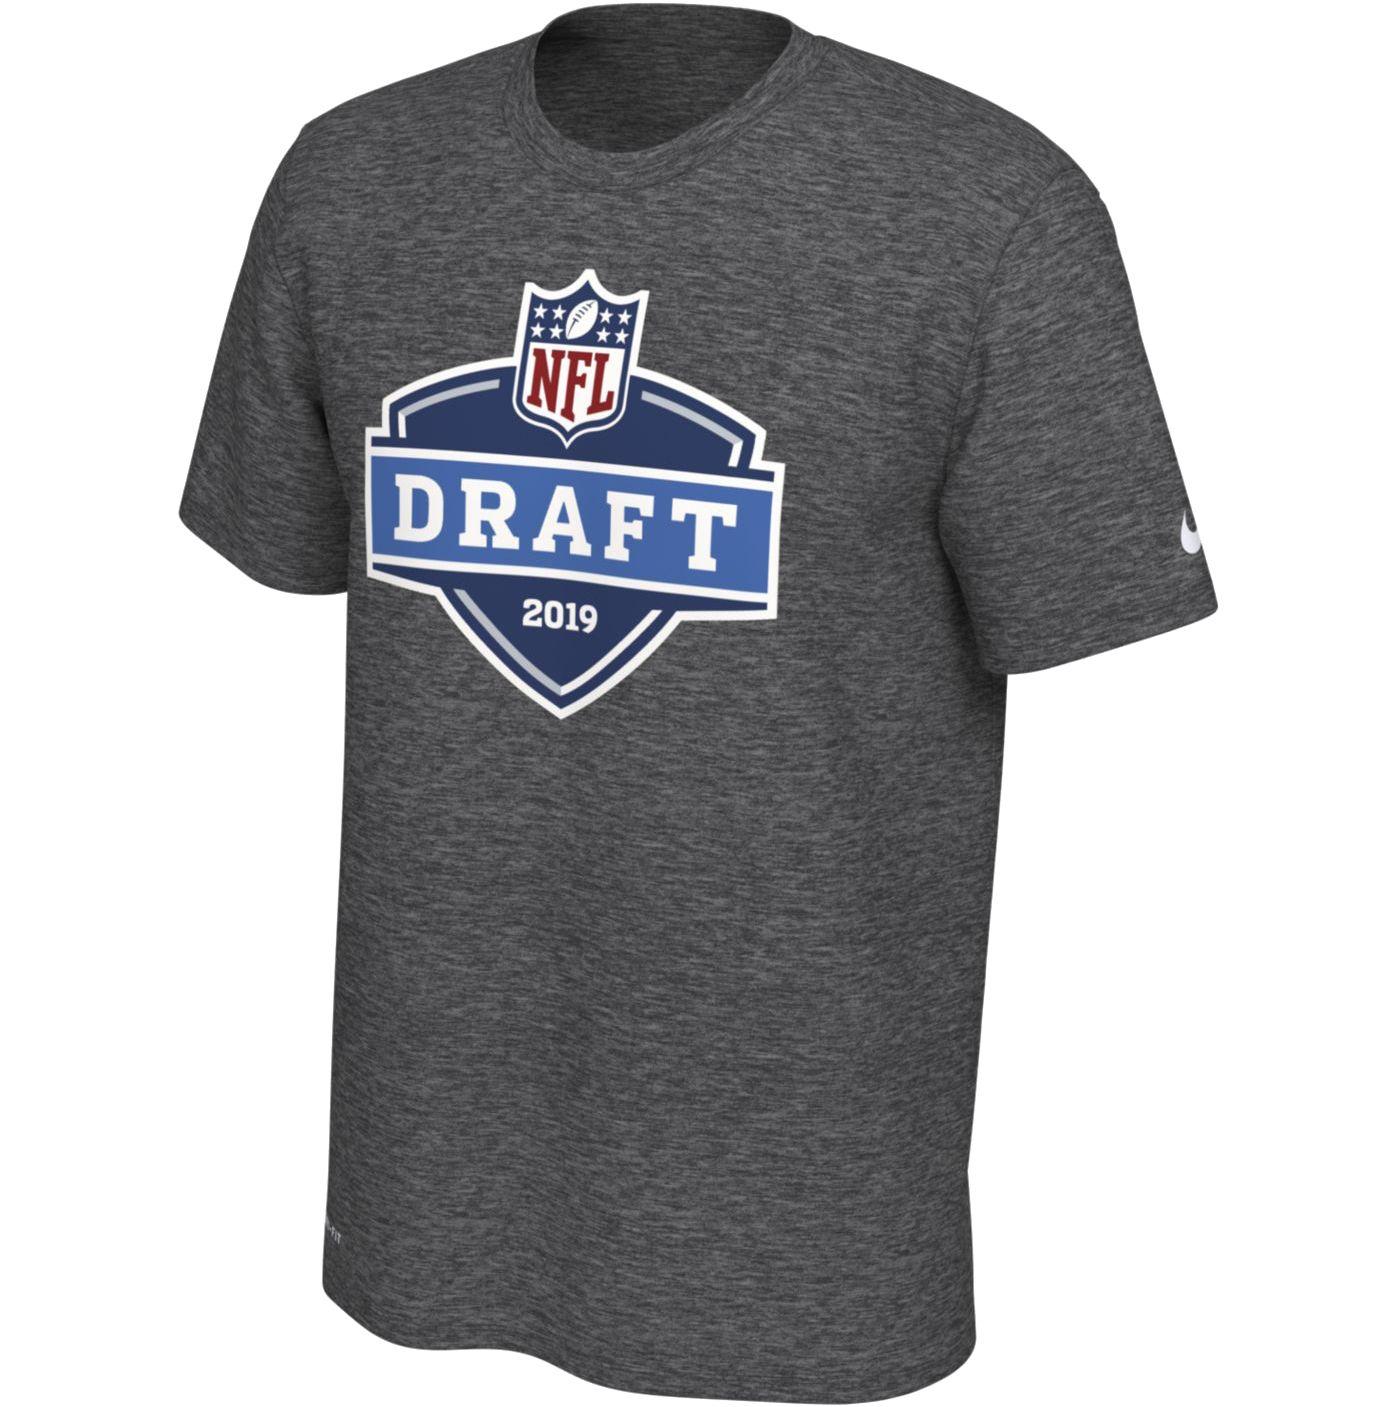 Nike Men's NFL Draft 2019 Legend Charcoal Performance T-Shirt